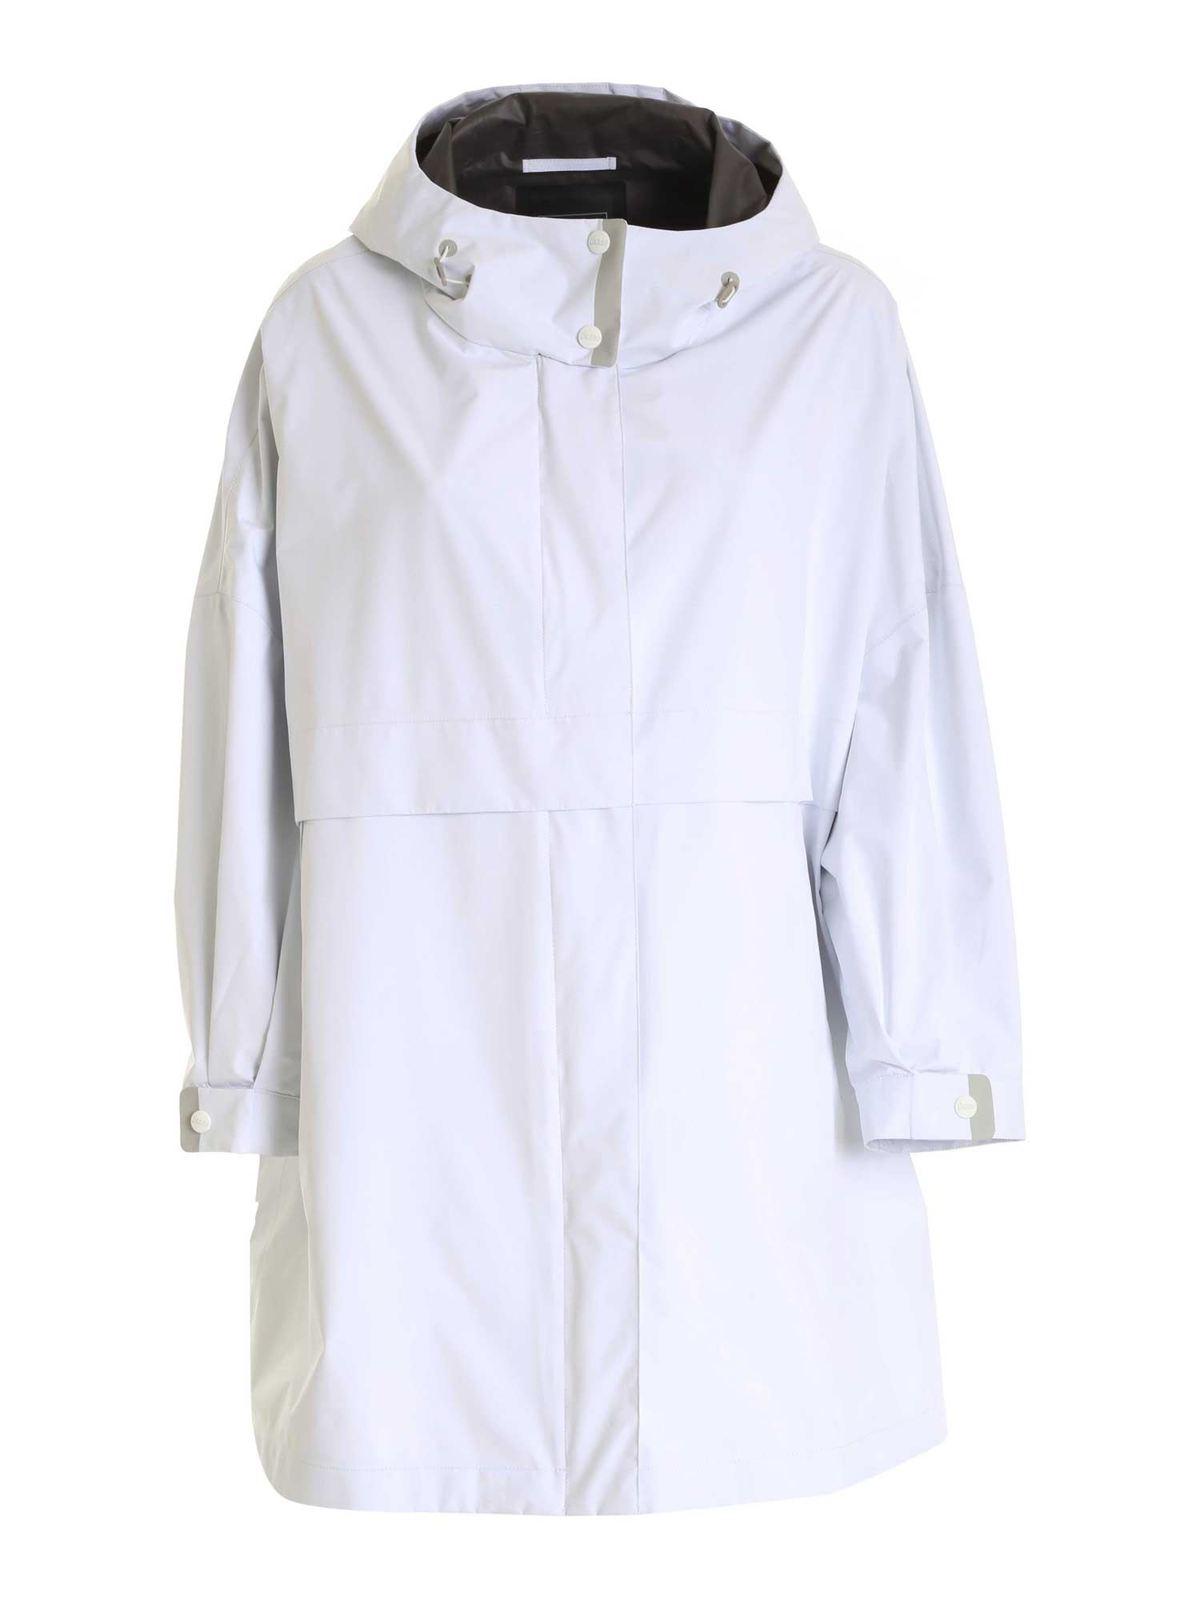 Herno Coats HOODED RAINCOAT IN WHITE